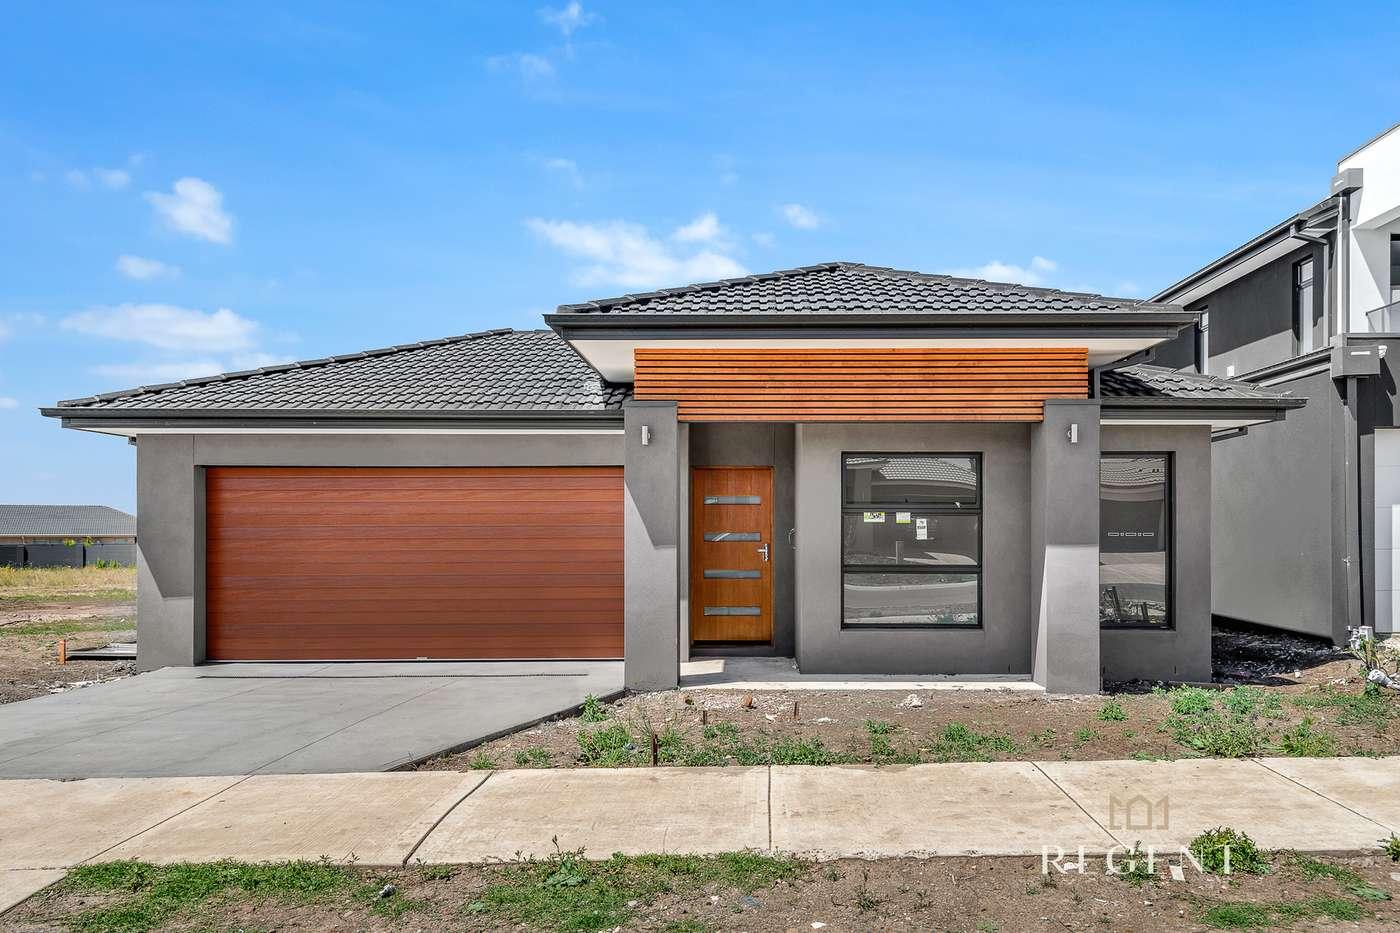 Main view of Homely house listing, 7 Daybreak Vista, Craigieburn, VIC 3064